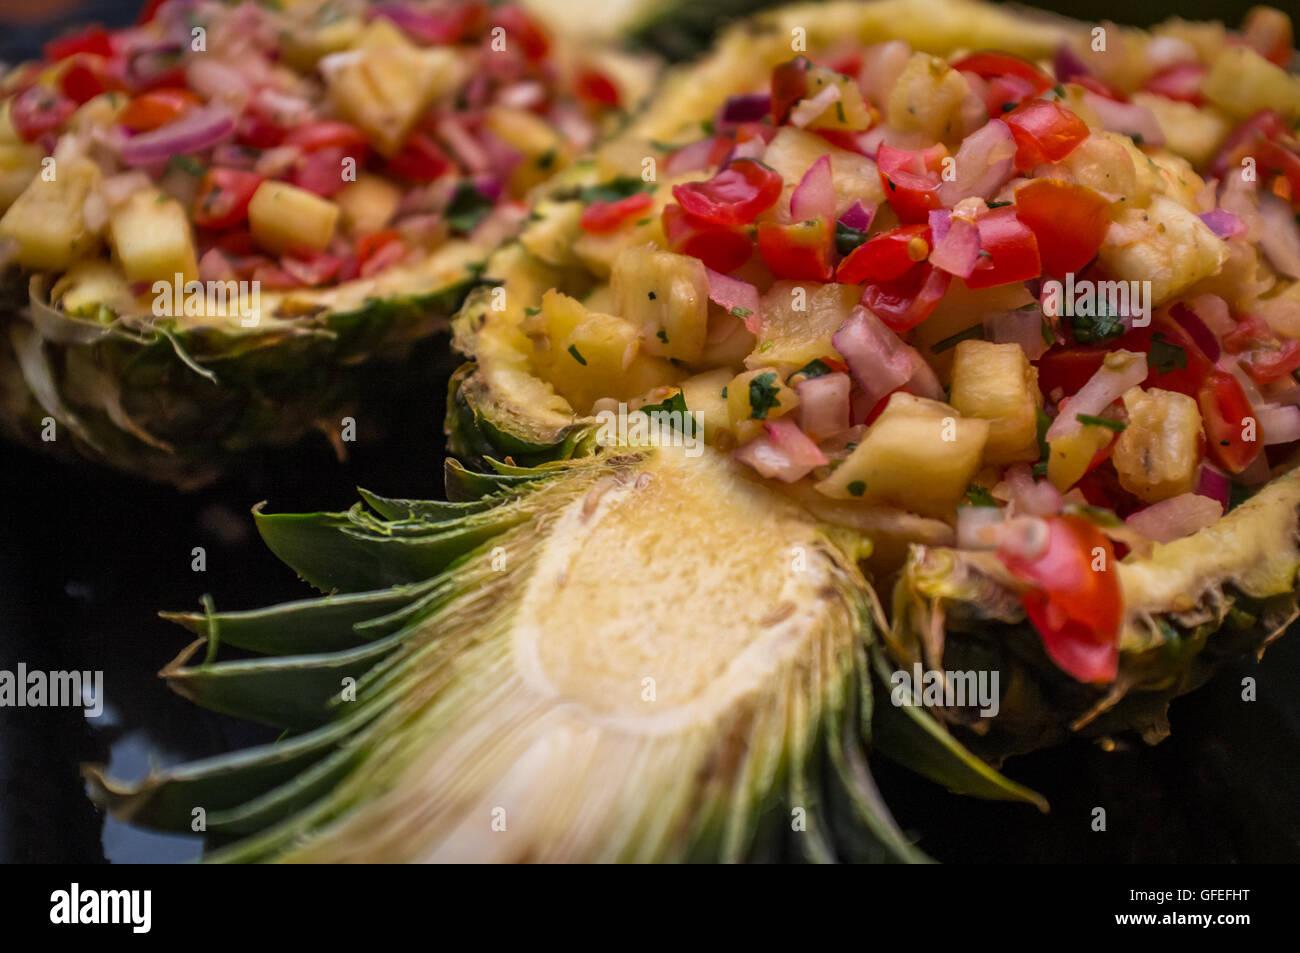 Fancy sweet whole pineapple half salsa South American appetizer Stock Photo